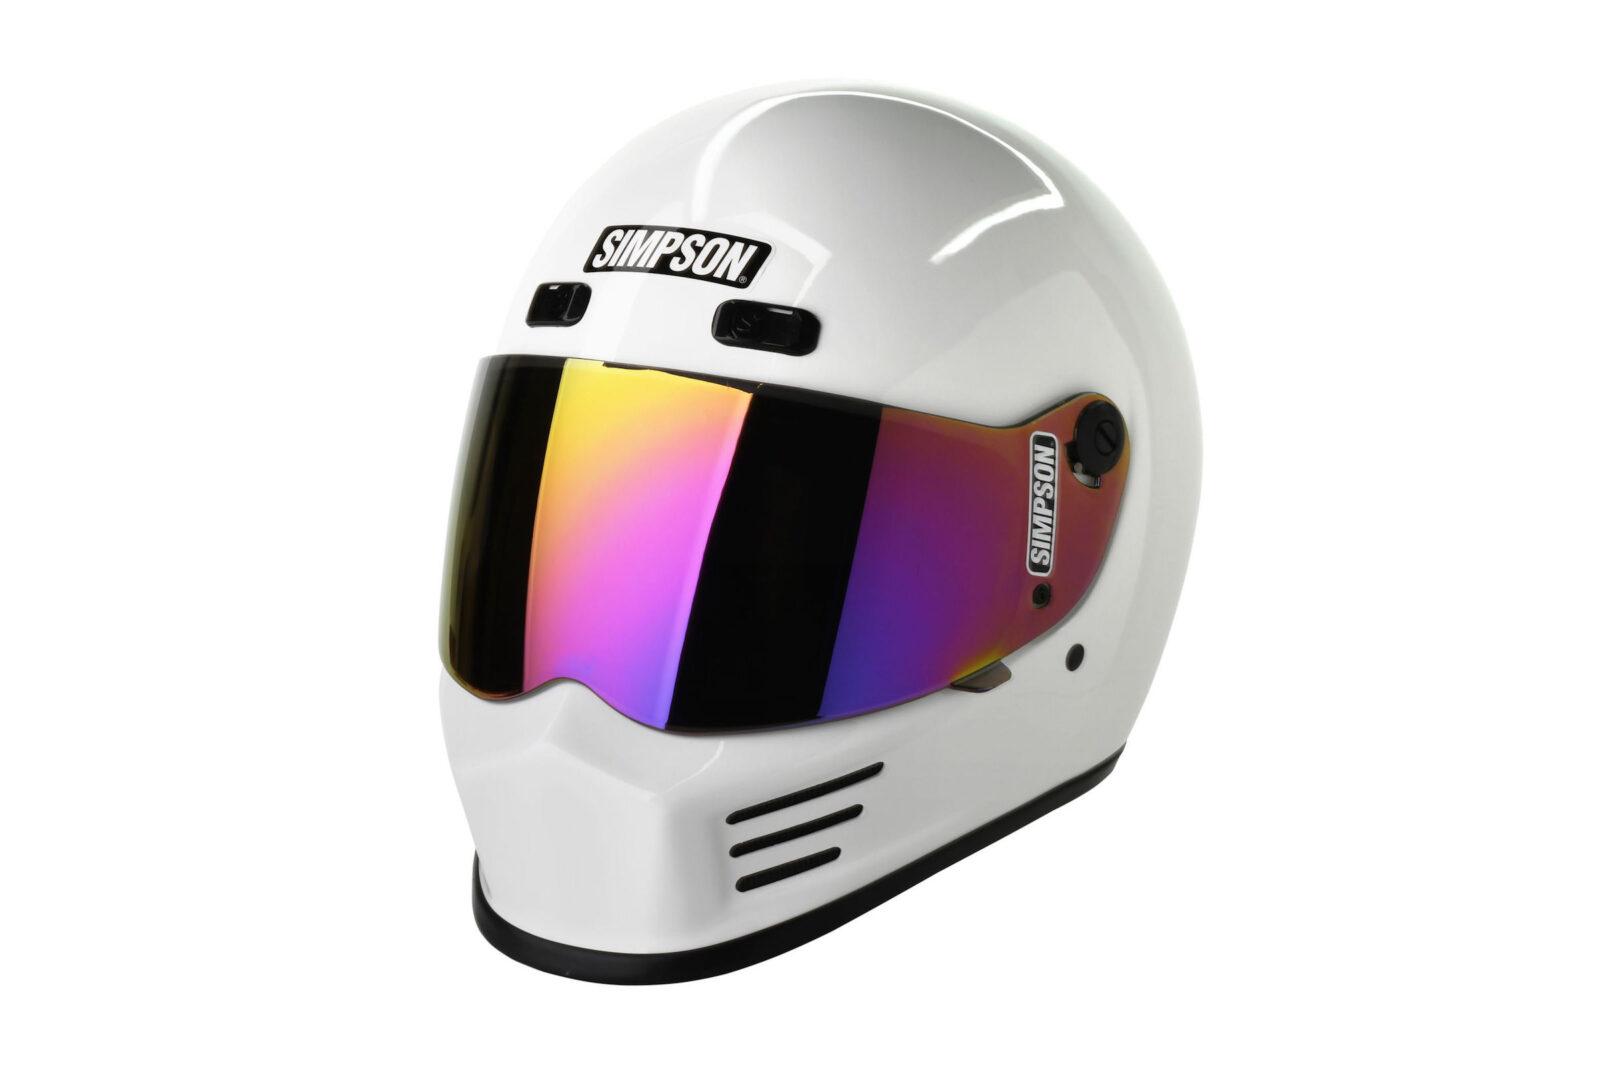 Simpson Street Bandit Helmet 1600x1081 - The Snell M2015 Certified Simpson Street Bandit Helmet